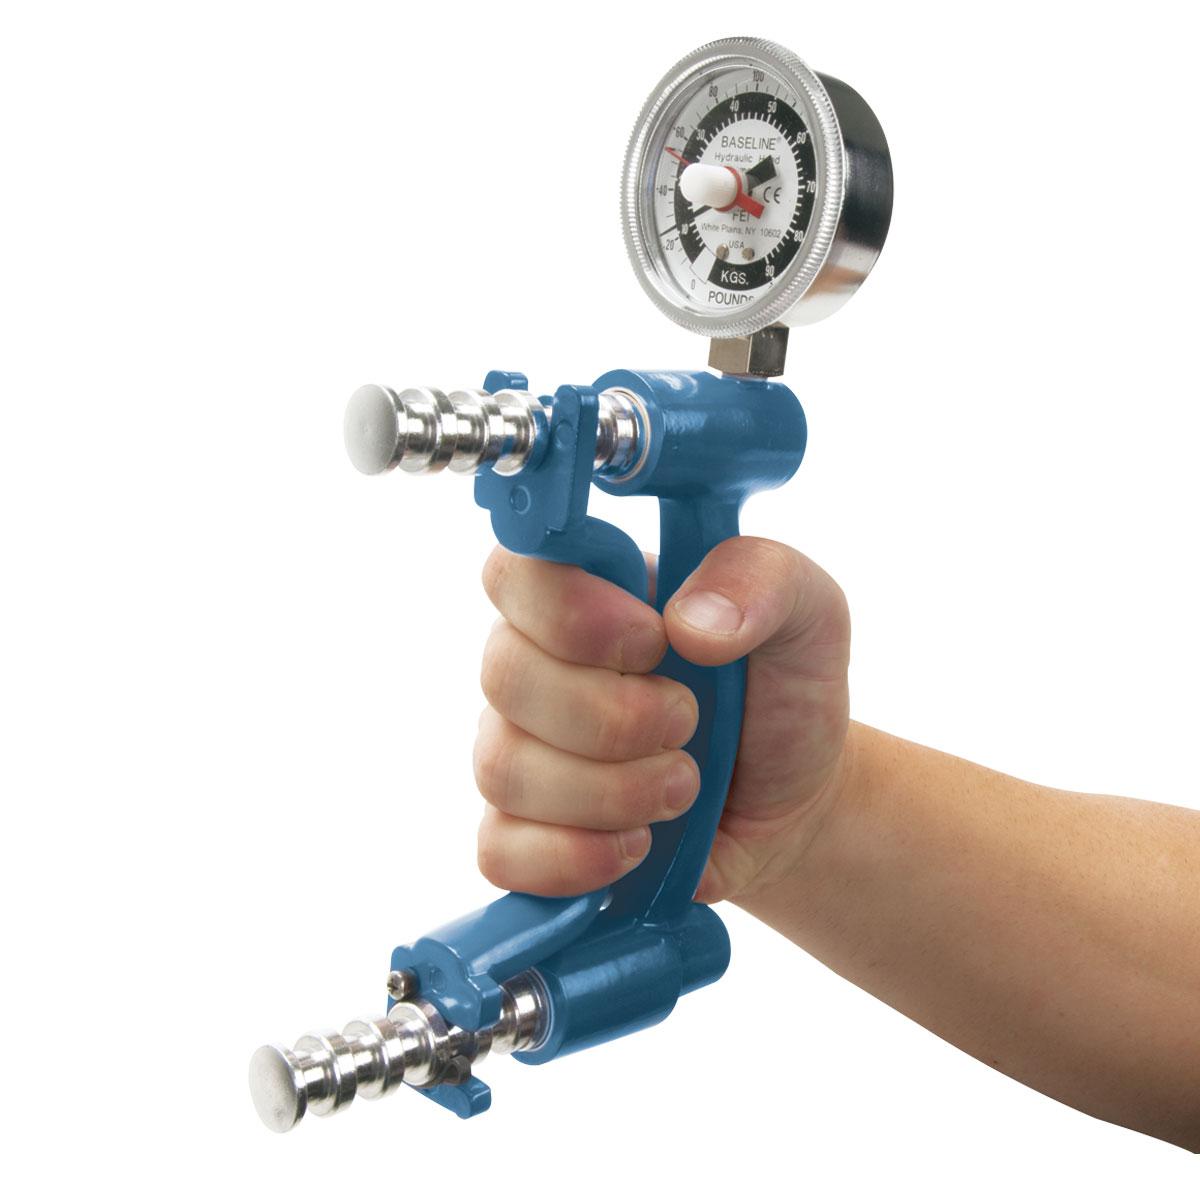 Hand Dynamometer | Baseline Dynamometer | Grip Strength